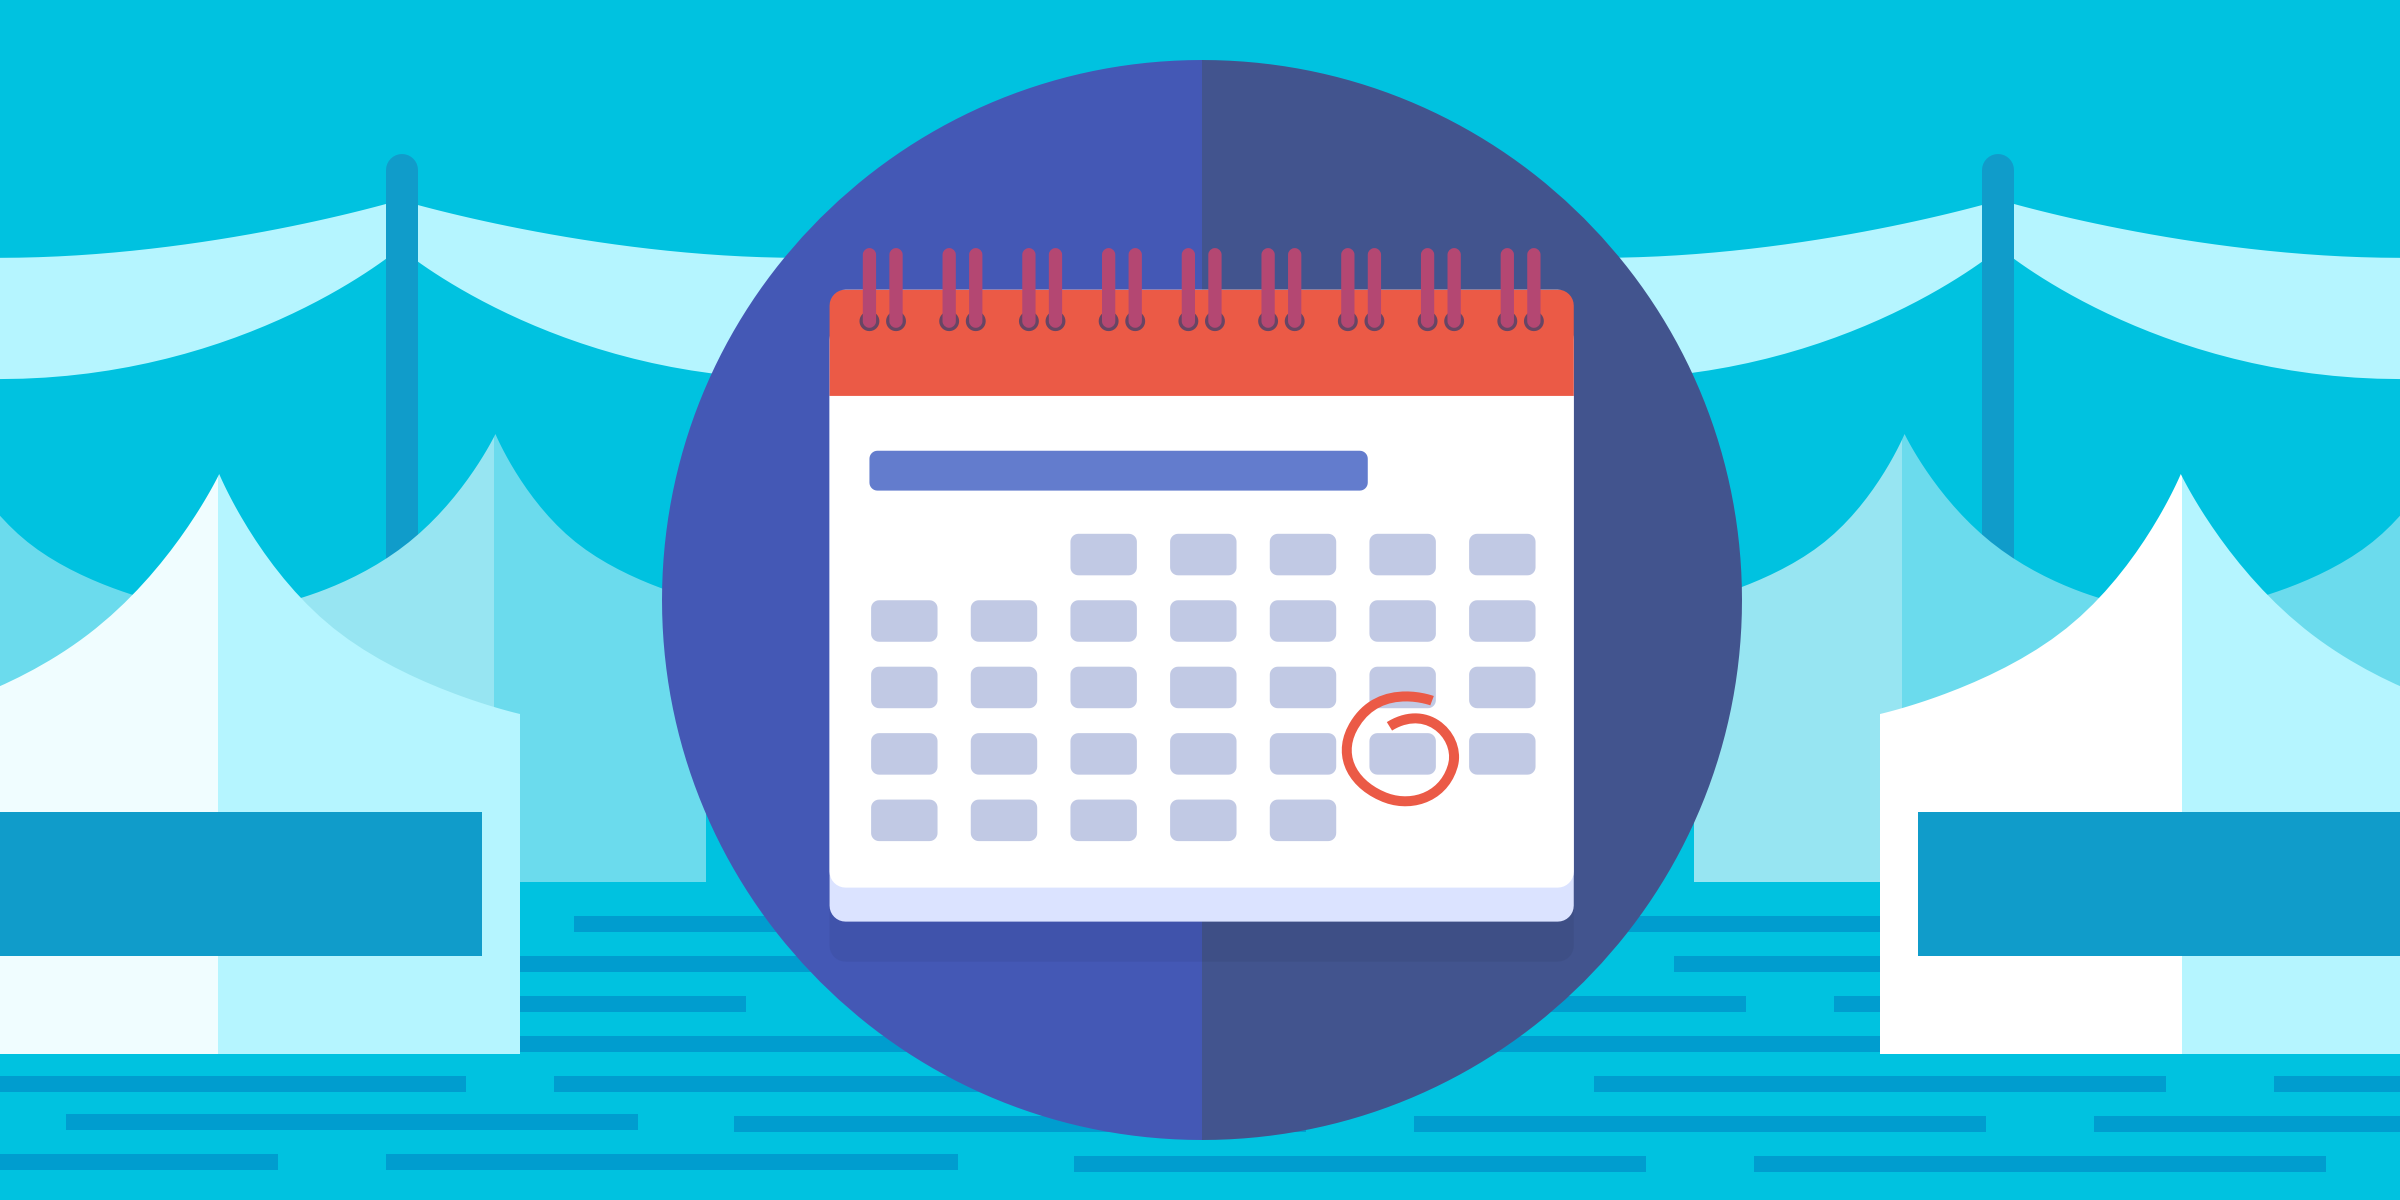 Tutorial sobre como definir lembretes personalizados de datas de entrega no Trello